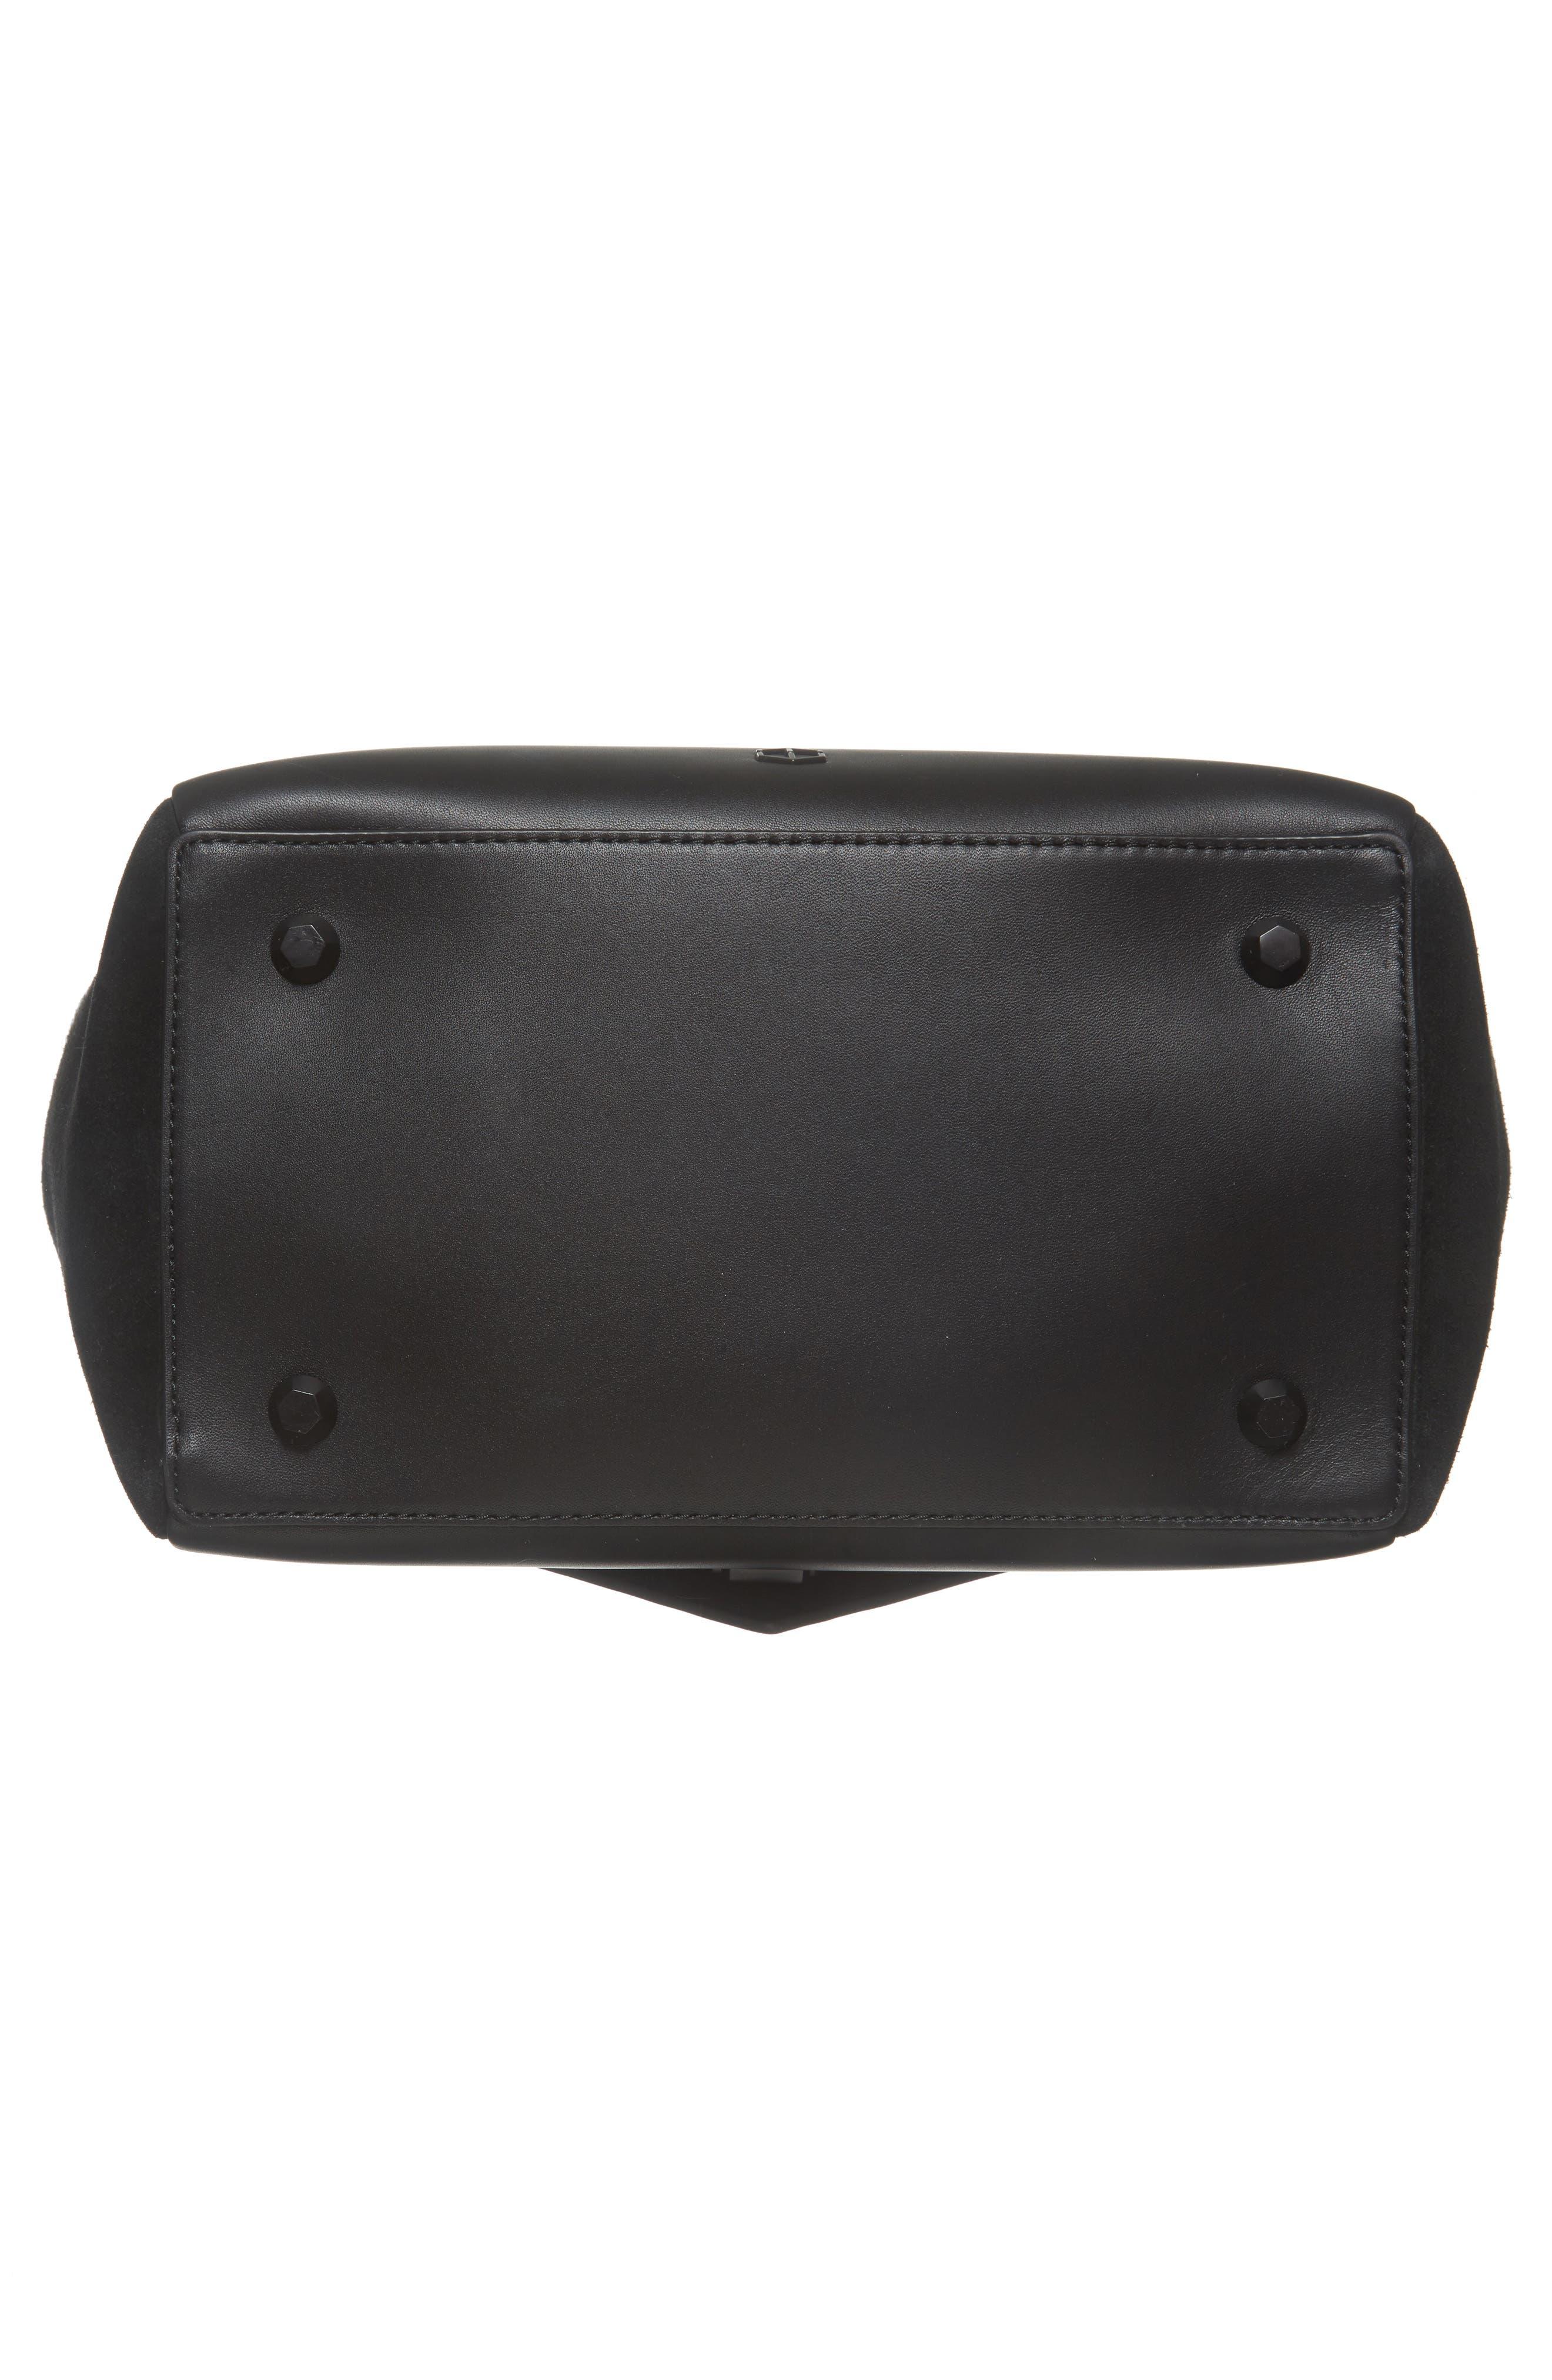 Saunter Colorblocked Leather & Suede Top Handle Satchel,                             Alternate thumbnail 6, color,                             003